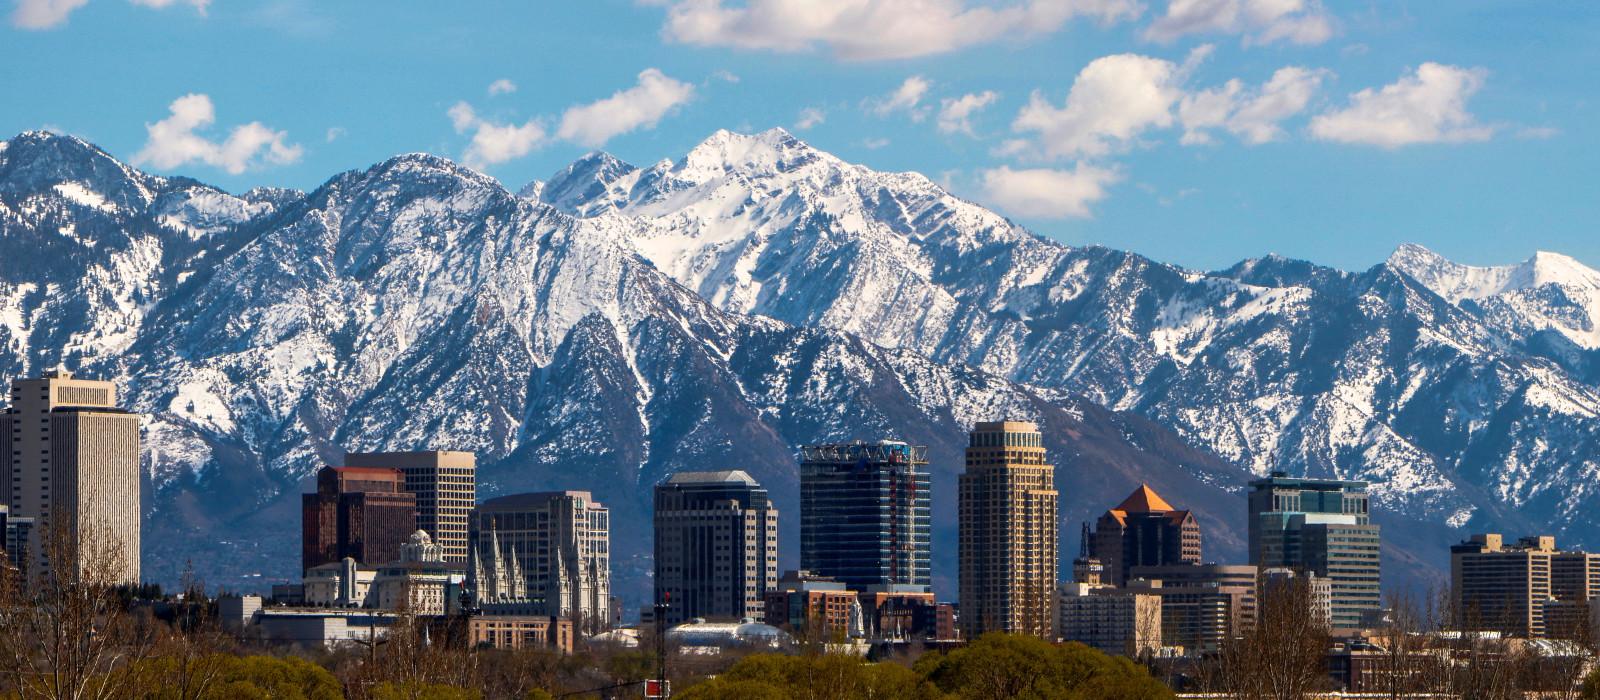 Reiseziel Salt Lake City USA